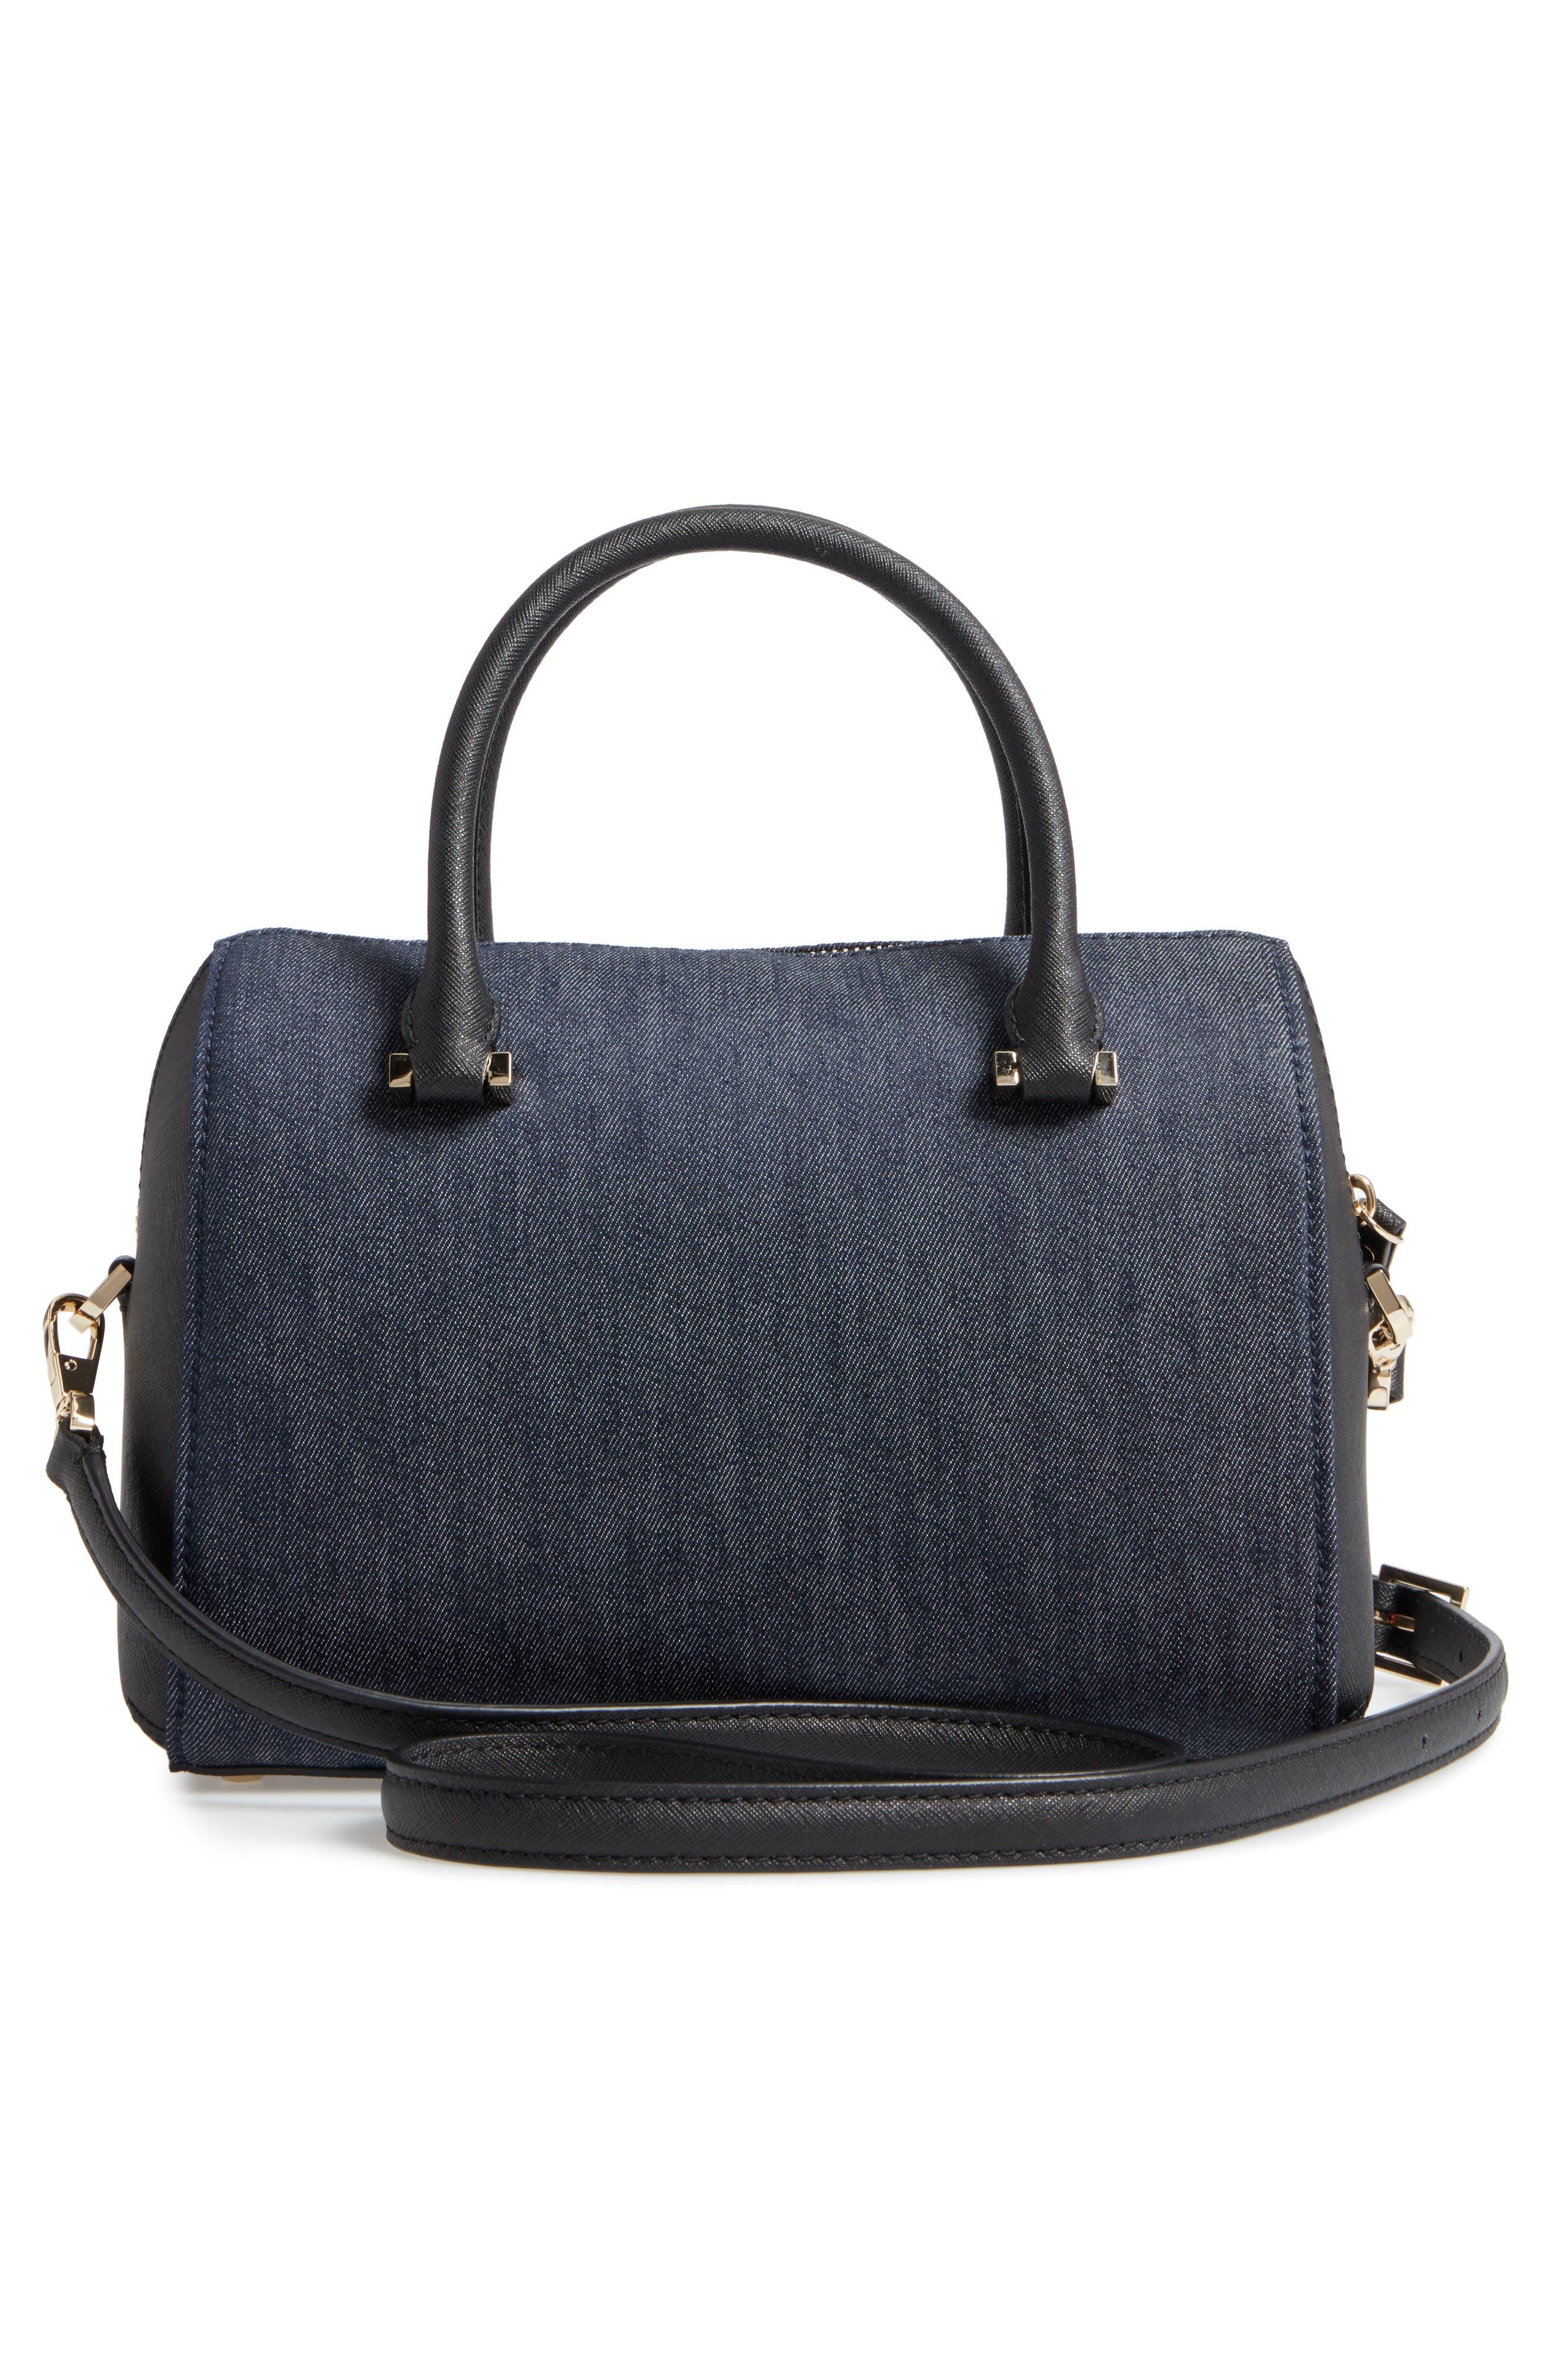 cameron street poppy large lane embroidered denim satchel,                             Alternate thumbnail 2, color,                             Port Blue